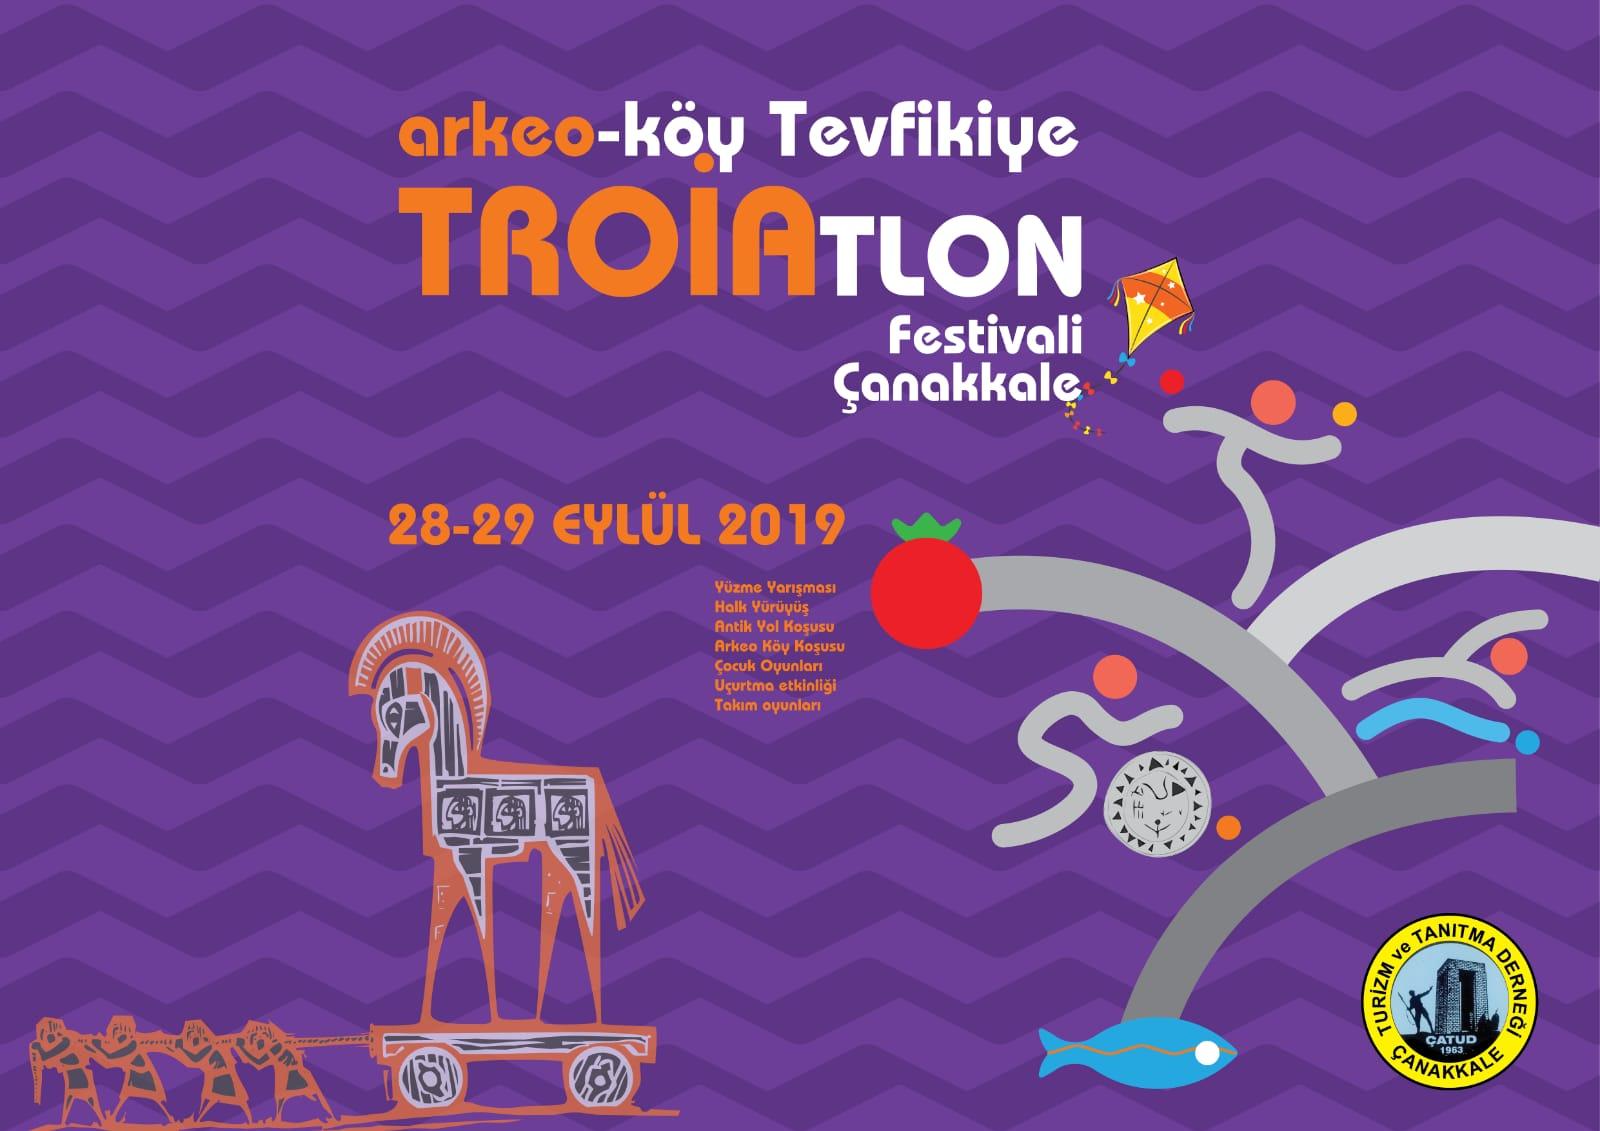 canakkale-troiatlon-festivali-1426